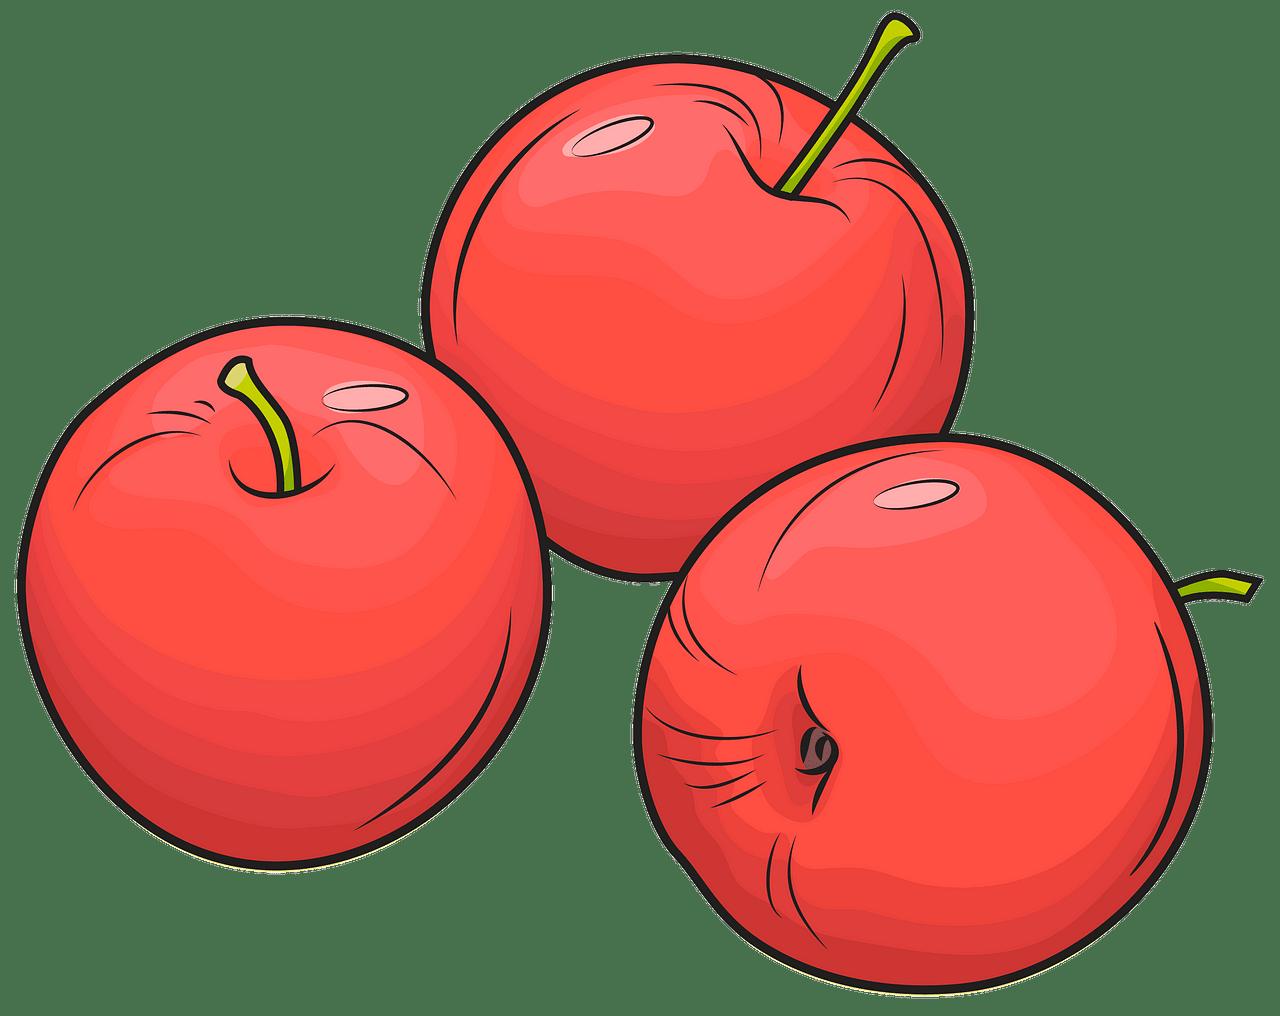 vector free stock Apples clipart. Free download creazilla